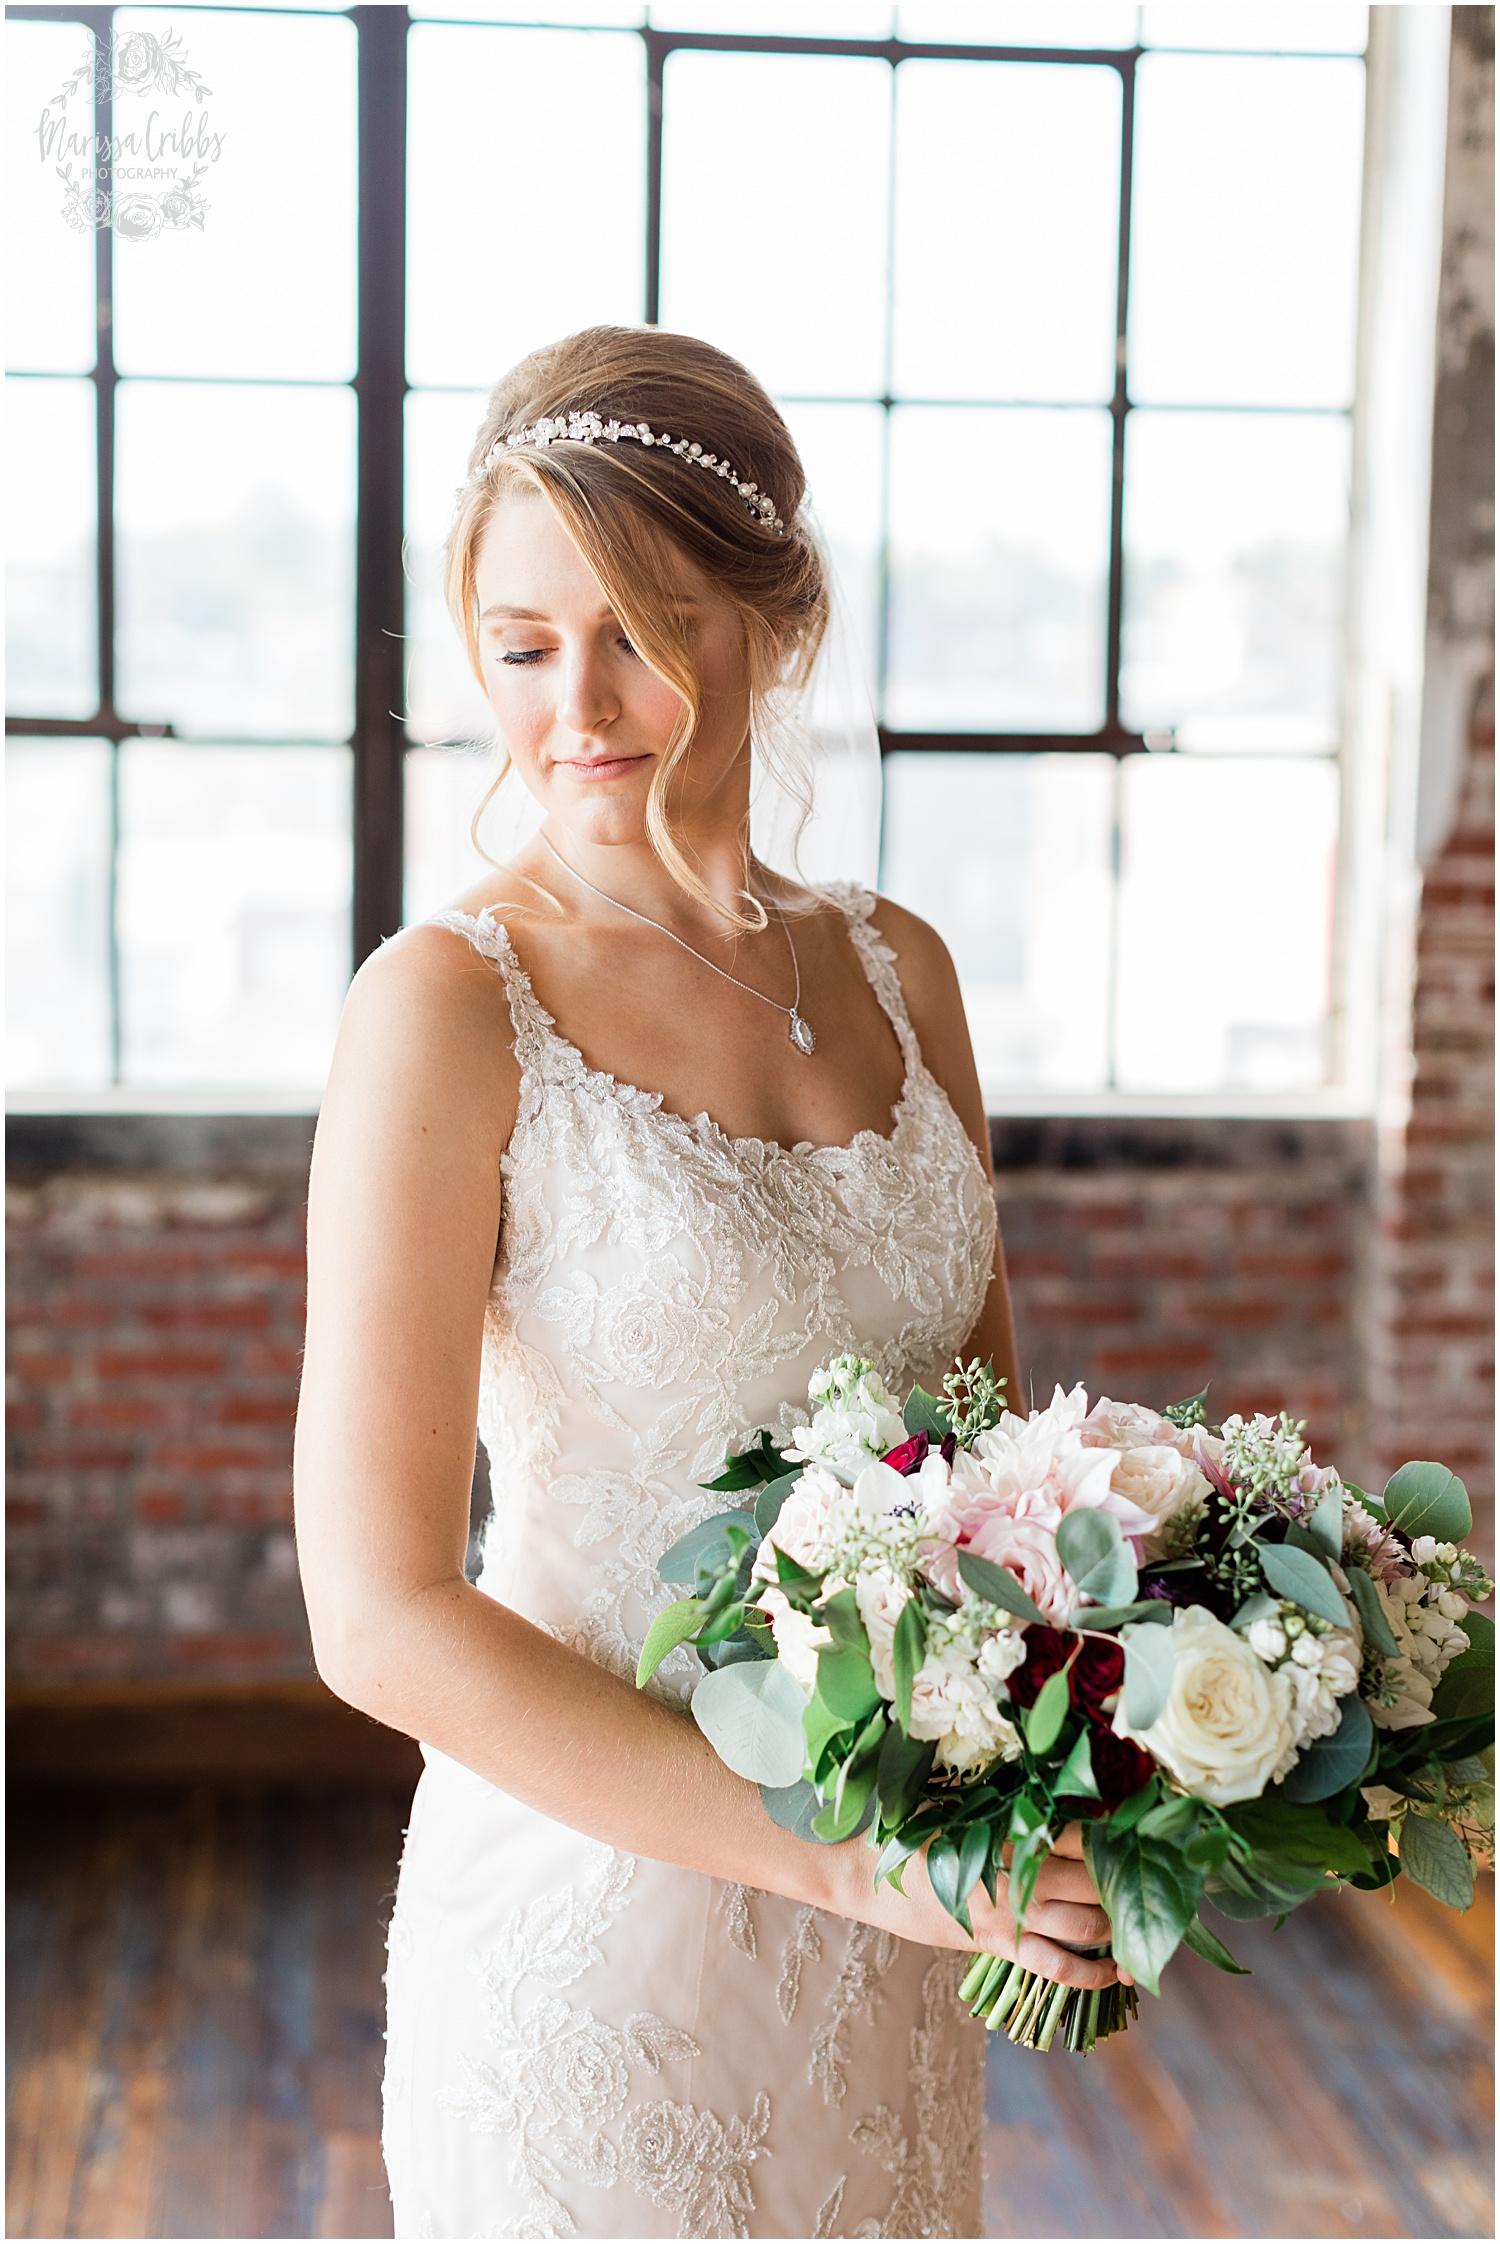 BAUER WEDDING   KELSEA & JUSTIN   MARISSA CRIBBS PHOTOGRAPHY_6512.jpg